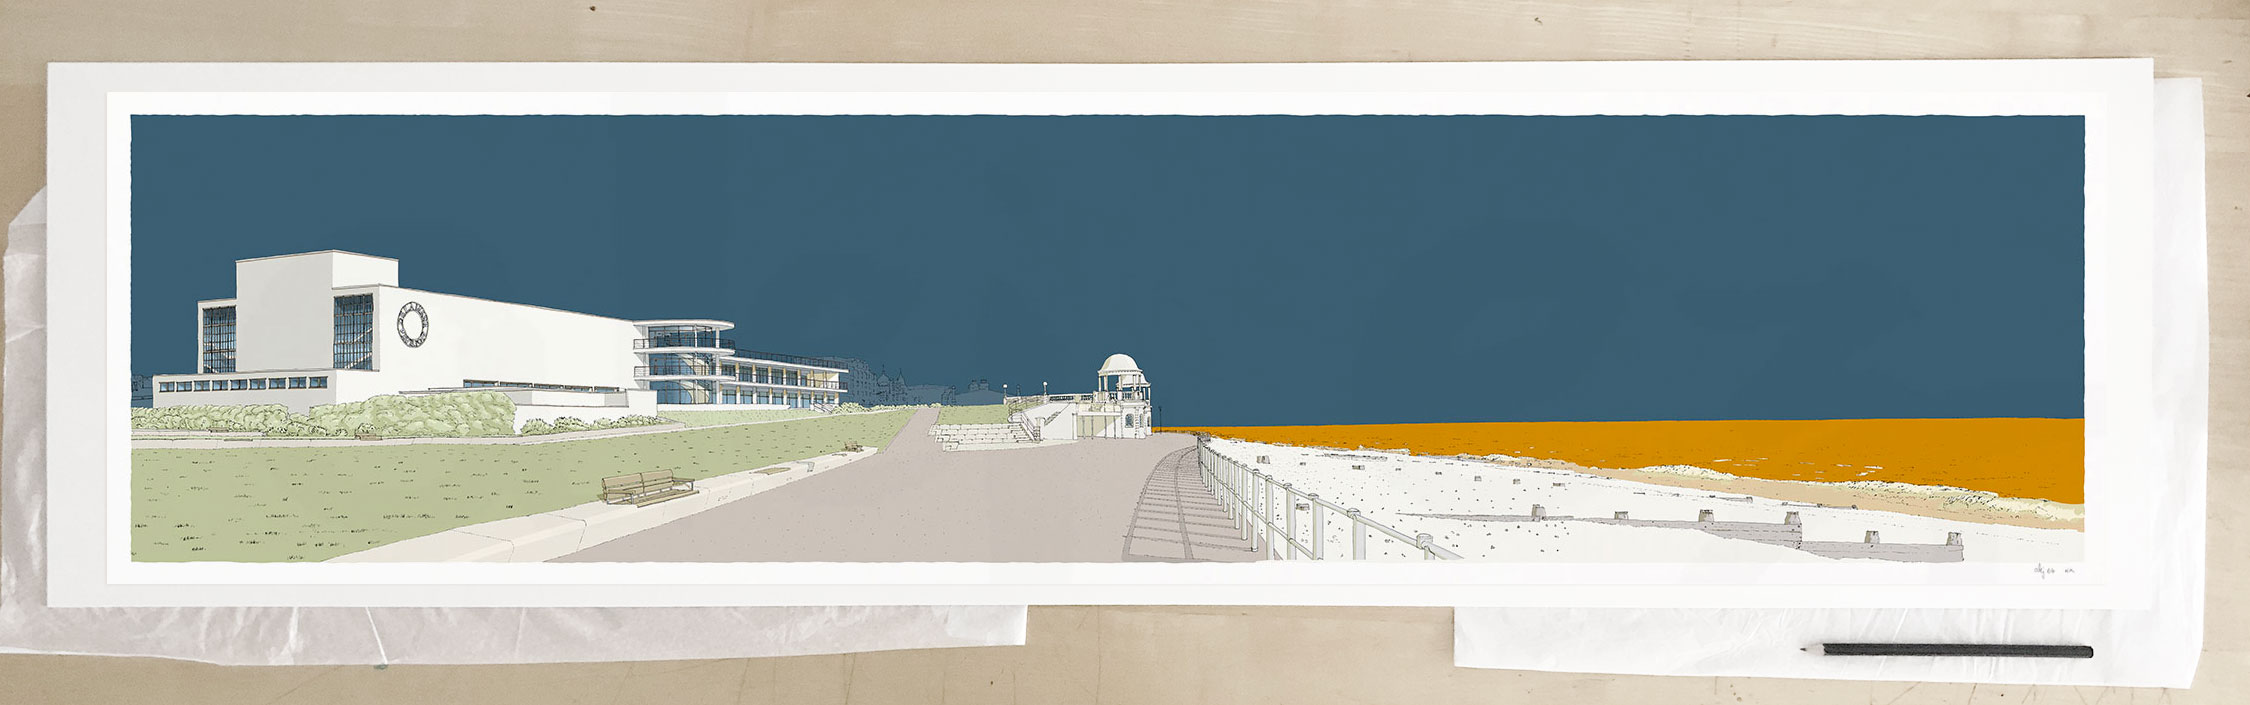 Fine art print by UK artist alej ez titled De La Warr Pavilion Bexhill on Sea Antique Blue and Ochre